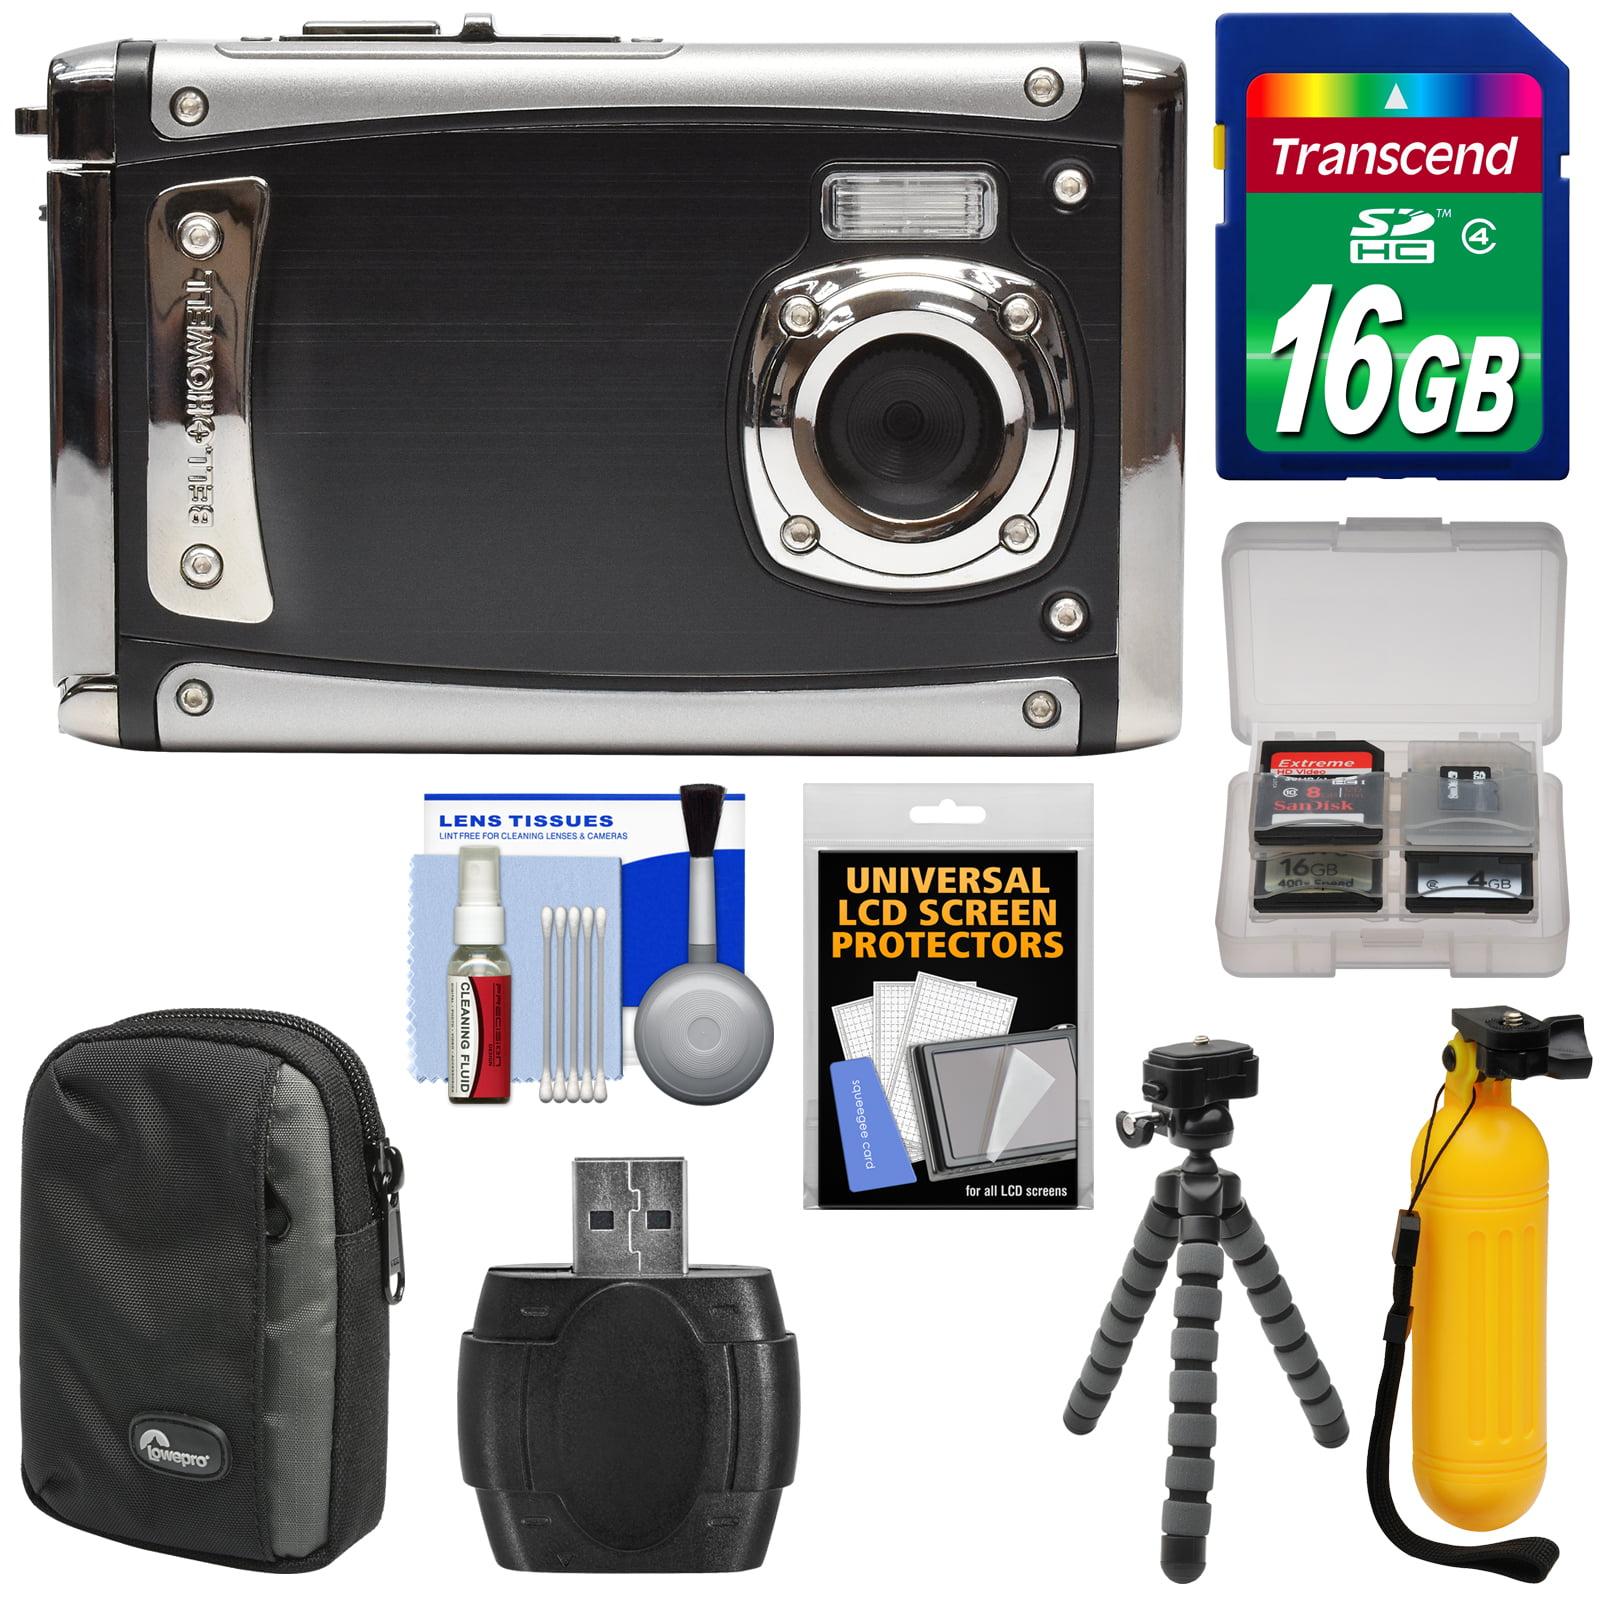 Bell & Howell Splash3 WP20 HD Shock & Waterproof Digital Camera (Red) with 16GB Card + Case + Buoy Handle + Tripod + Kit